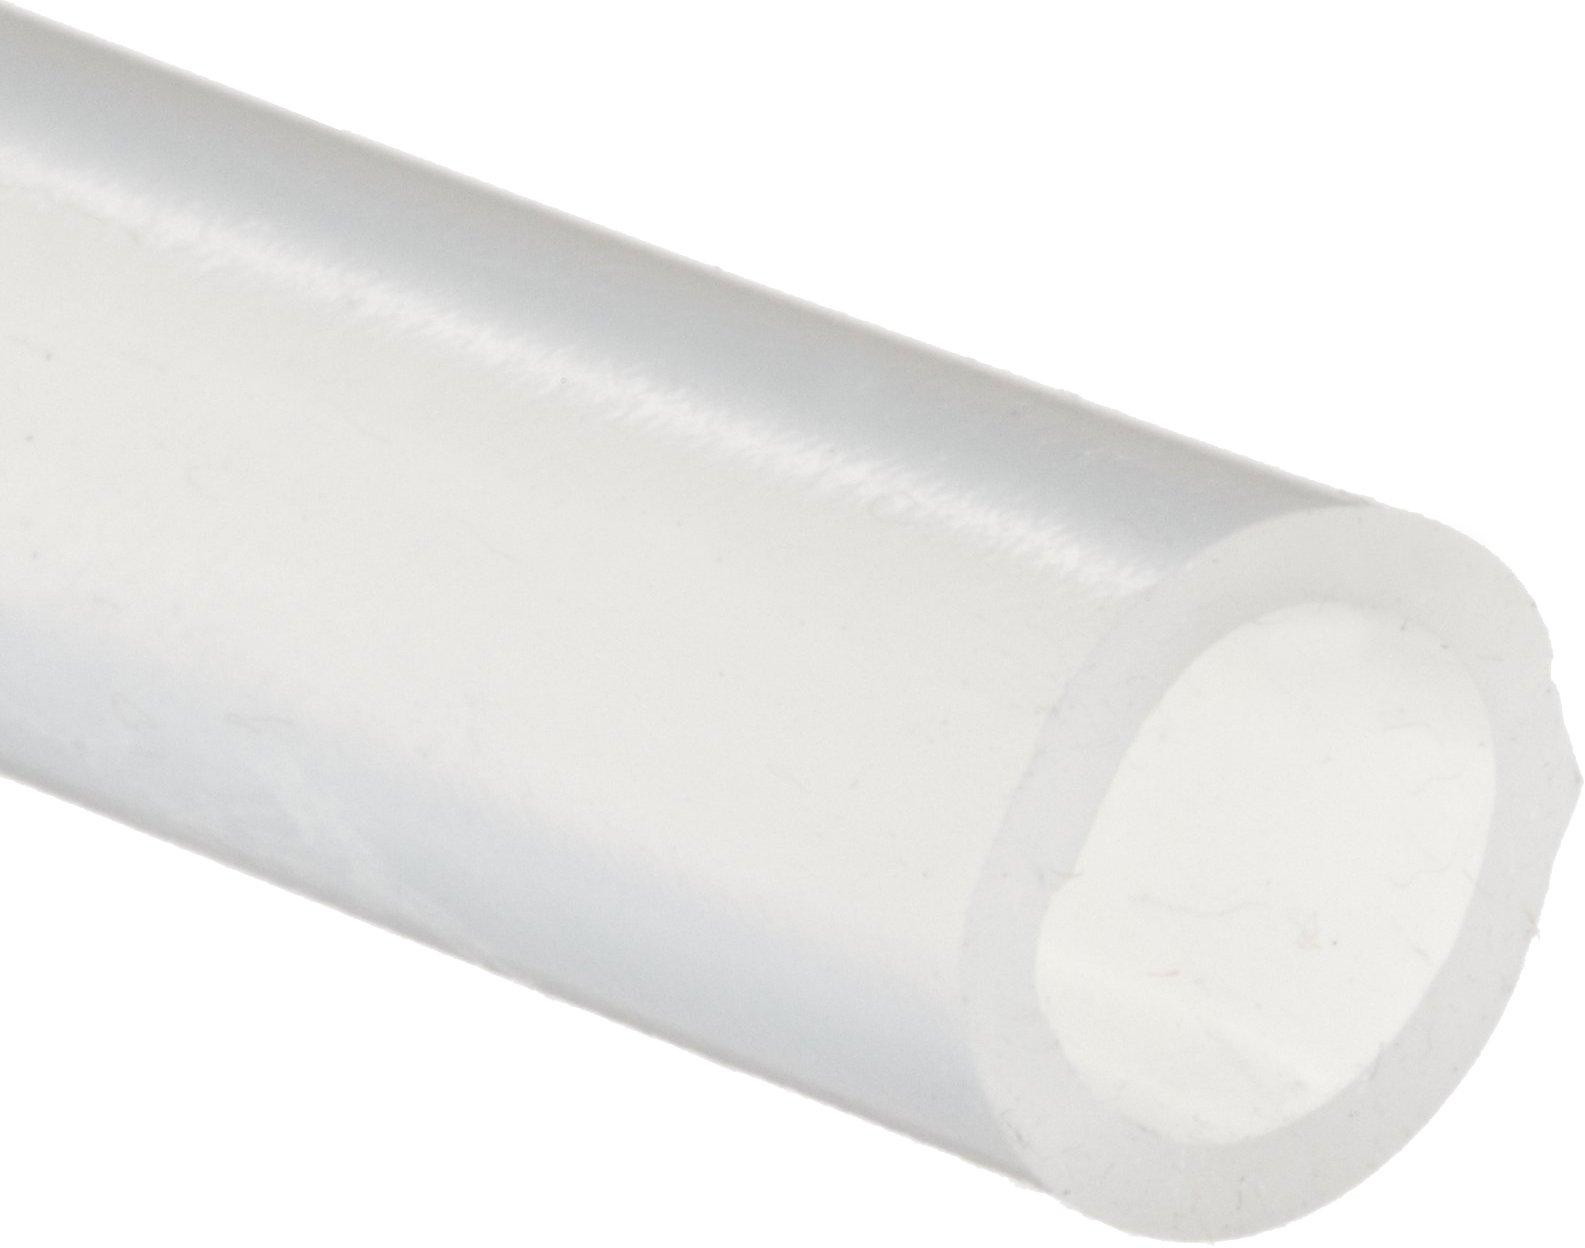 Tygon Versilic SPX-50 Silicone Tubing, 3/8'' ID, 1/2'' OD, 1/16''  Wall, 50' Length, Translucent